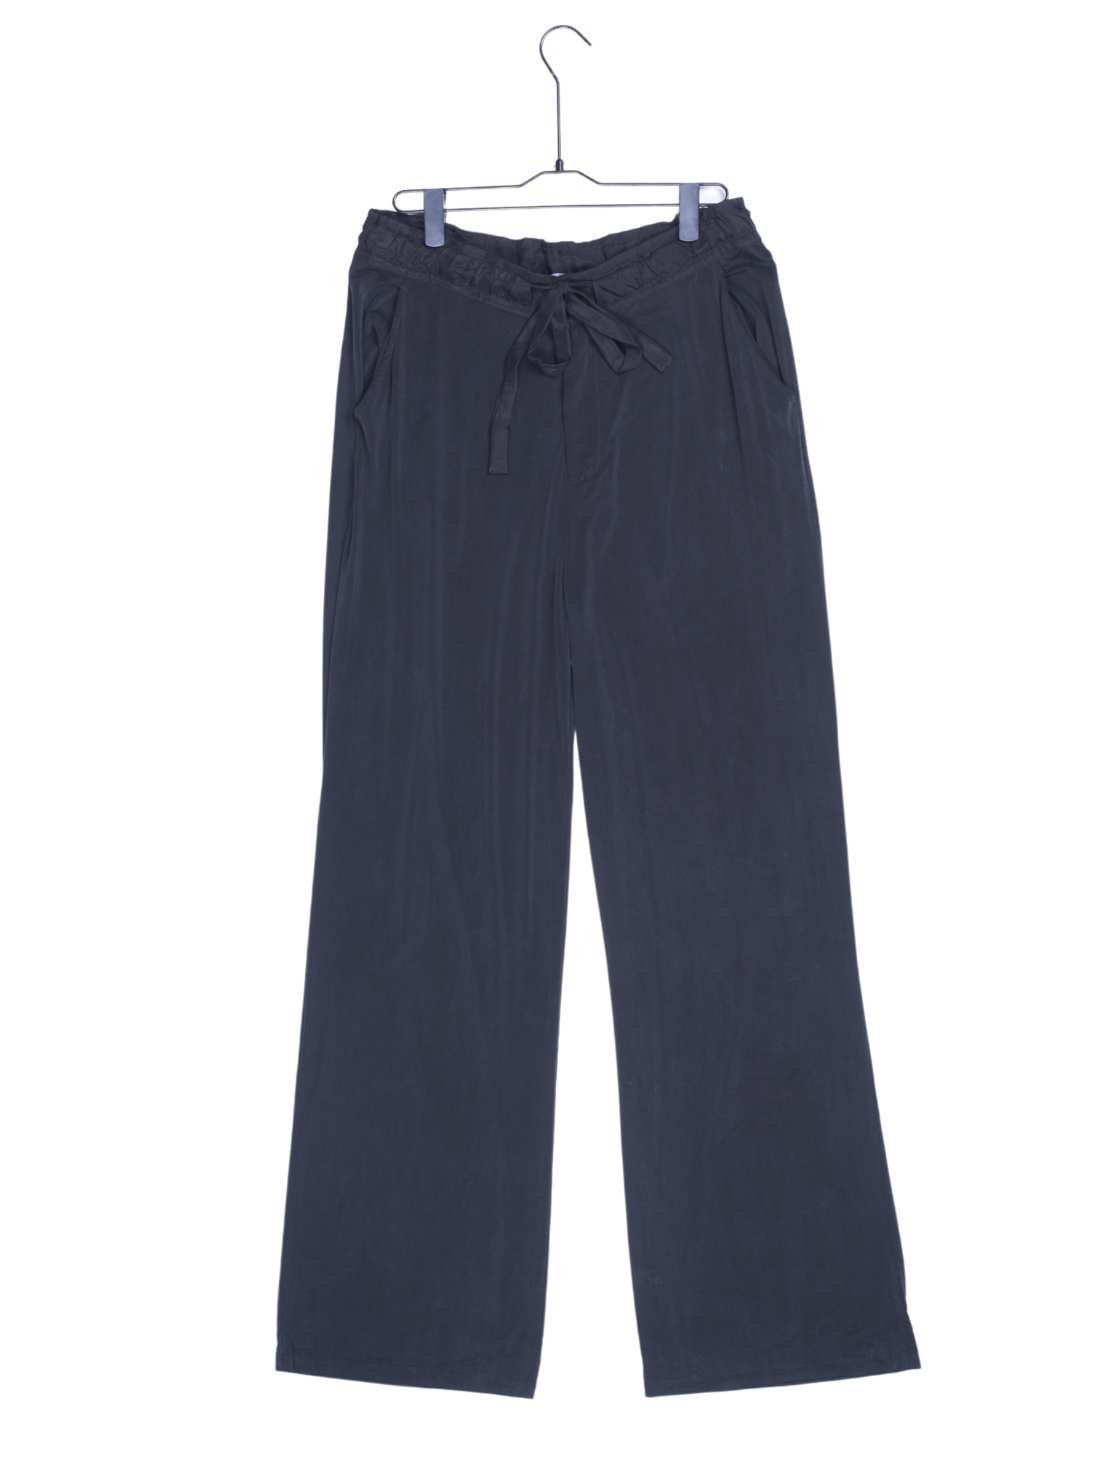 Ladies Jersery Cupro Strait Leggs Pants